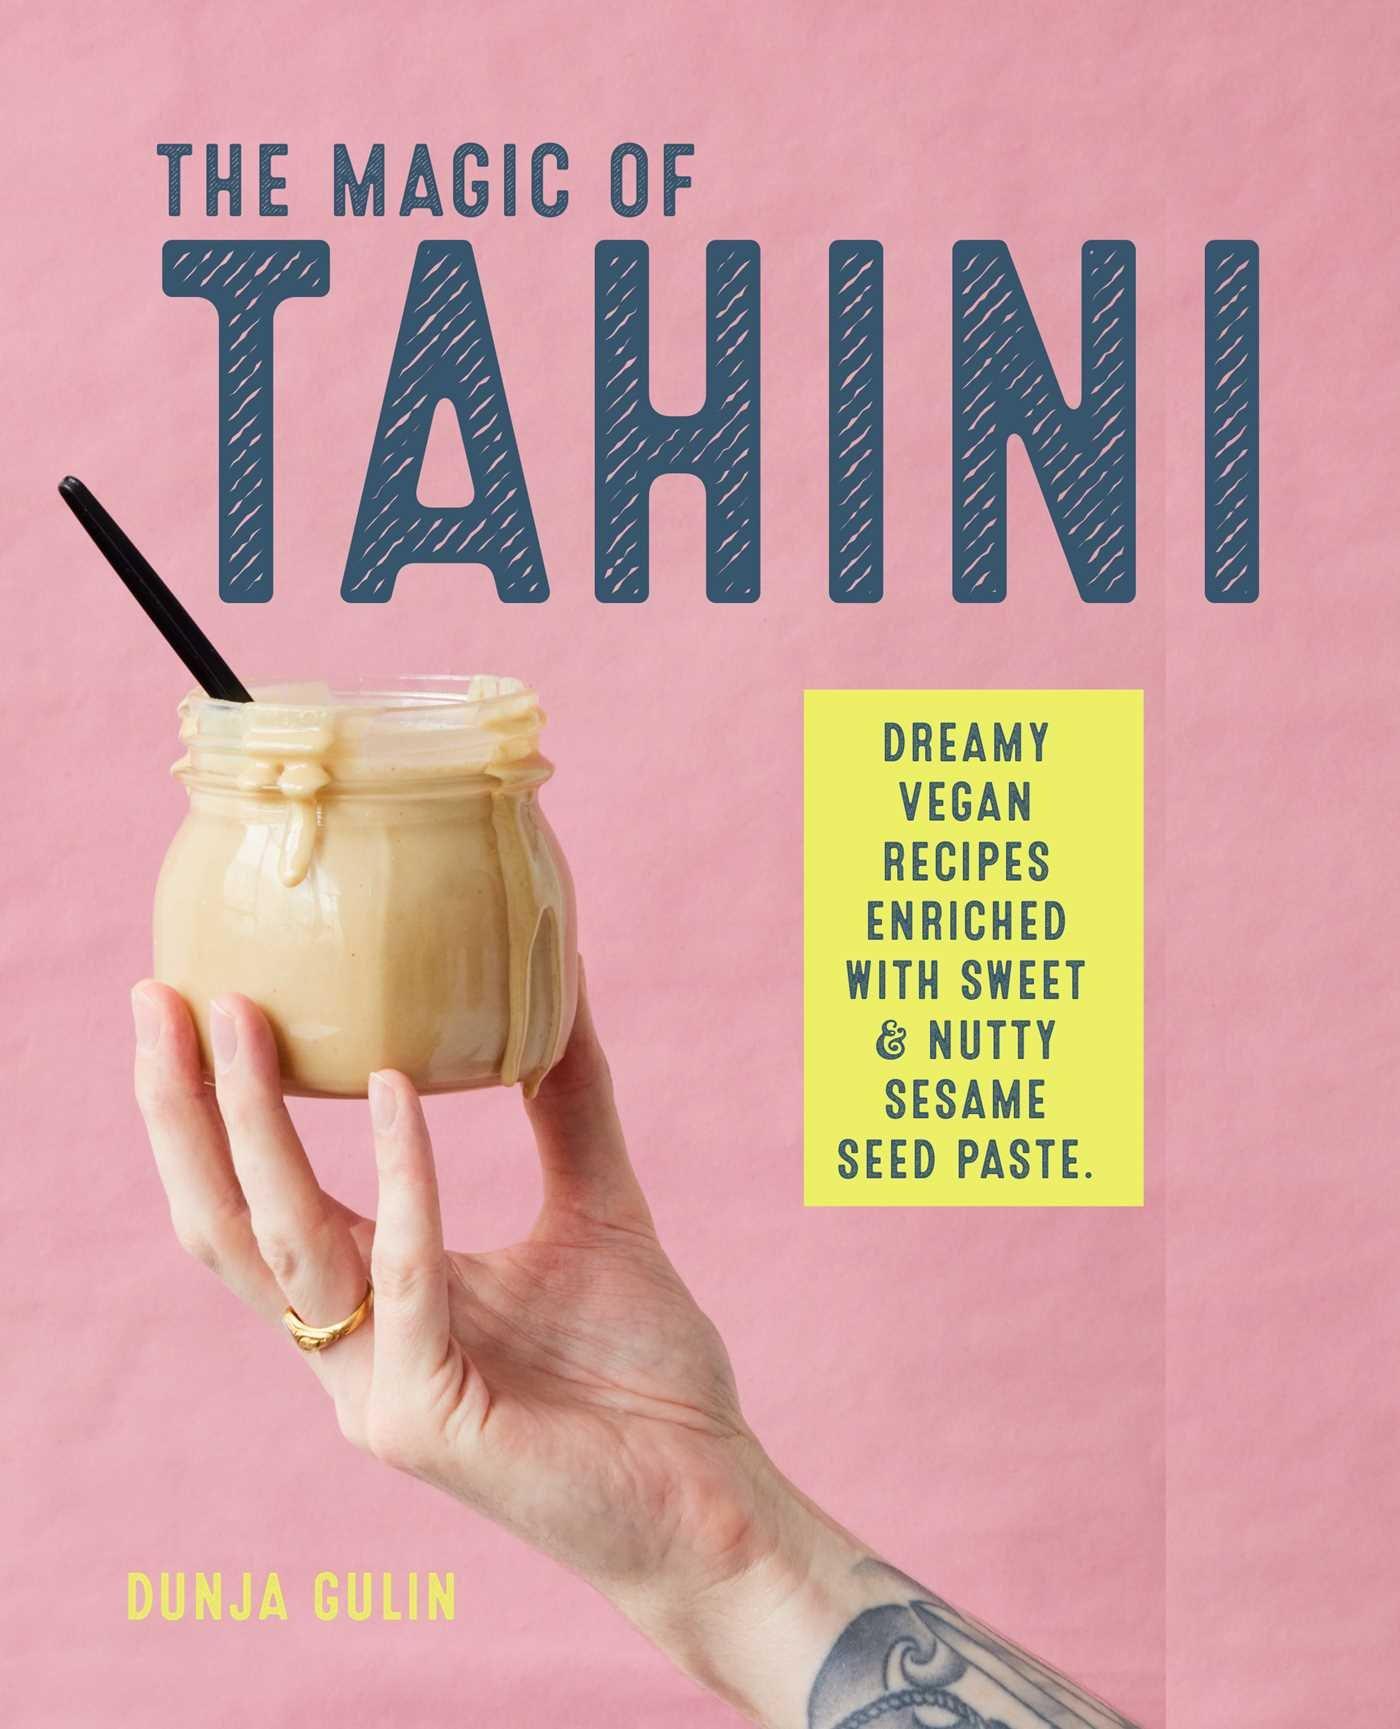 The Magic of Tahini: Vegan Recipes Enriched with Sweet & Nutty Sesame Seed Paste: Amazon.es: Dunja Gulin: Libros en idiomas extranjeros